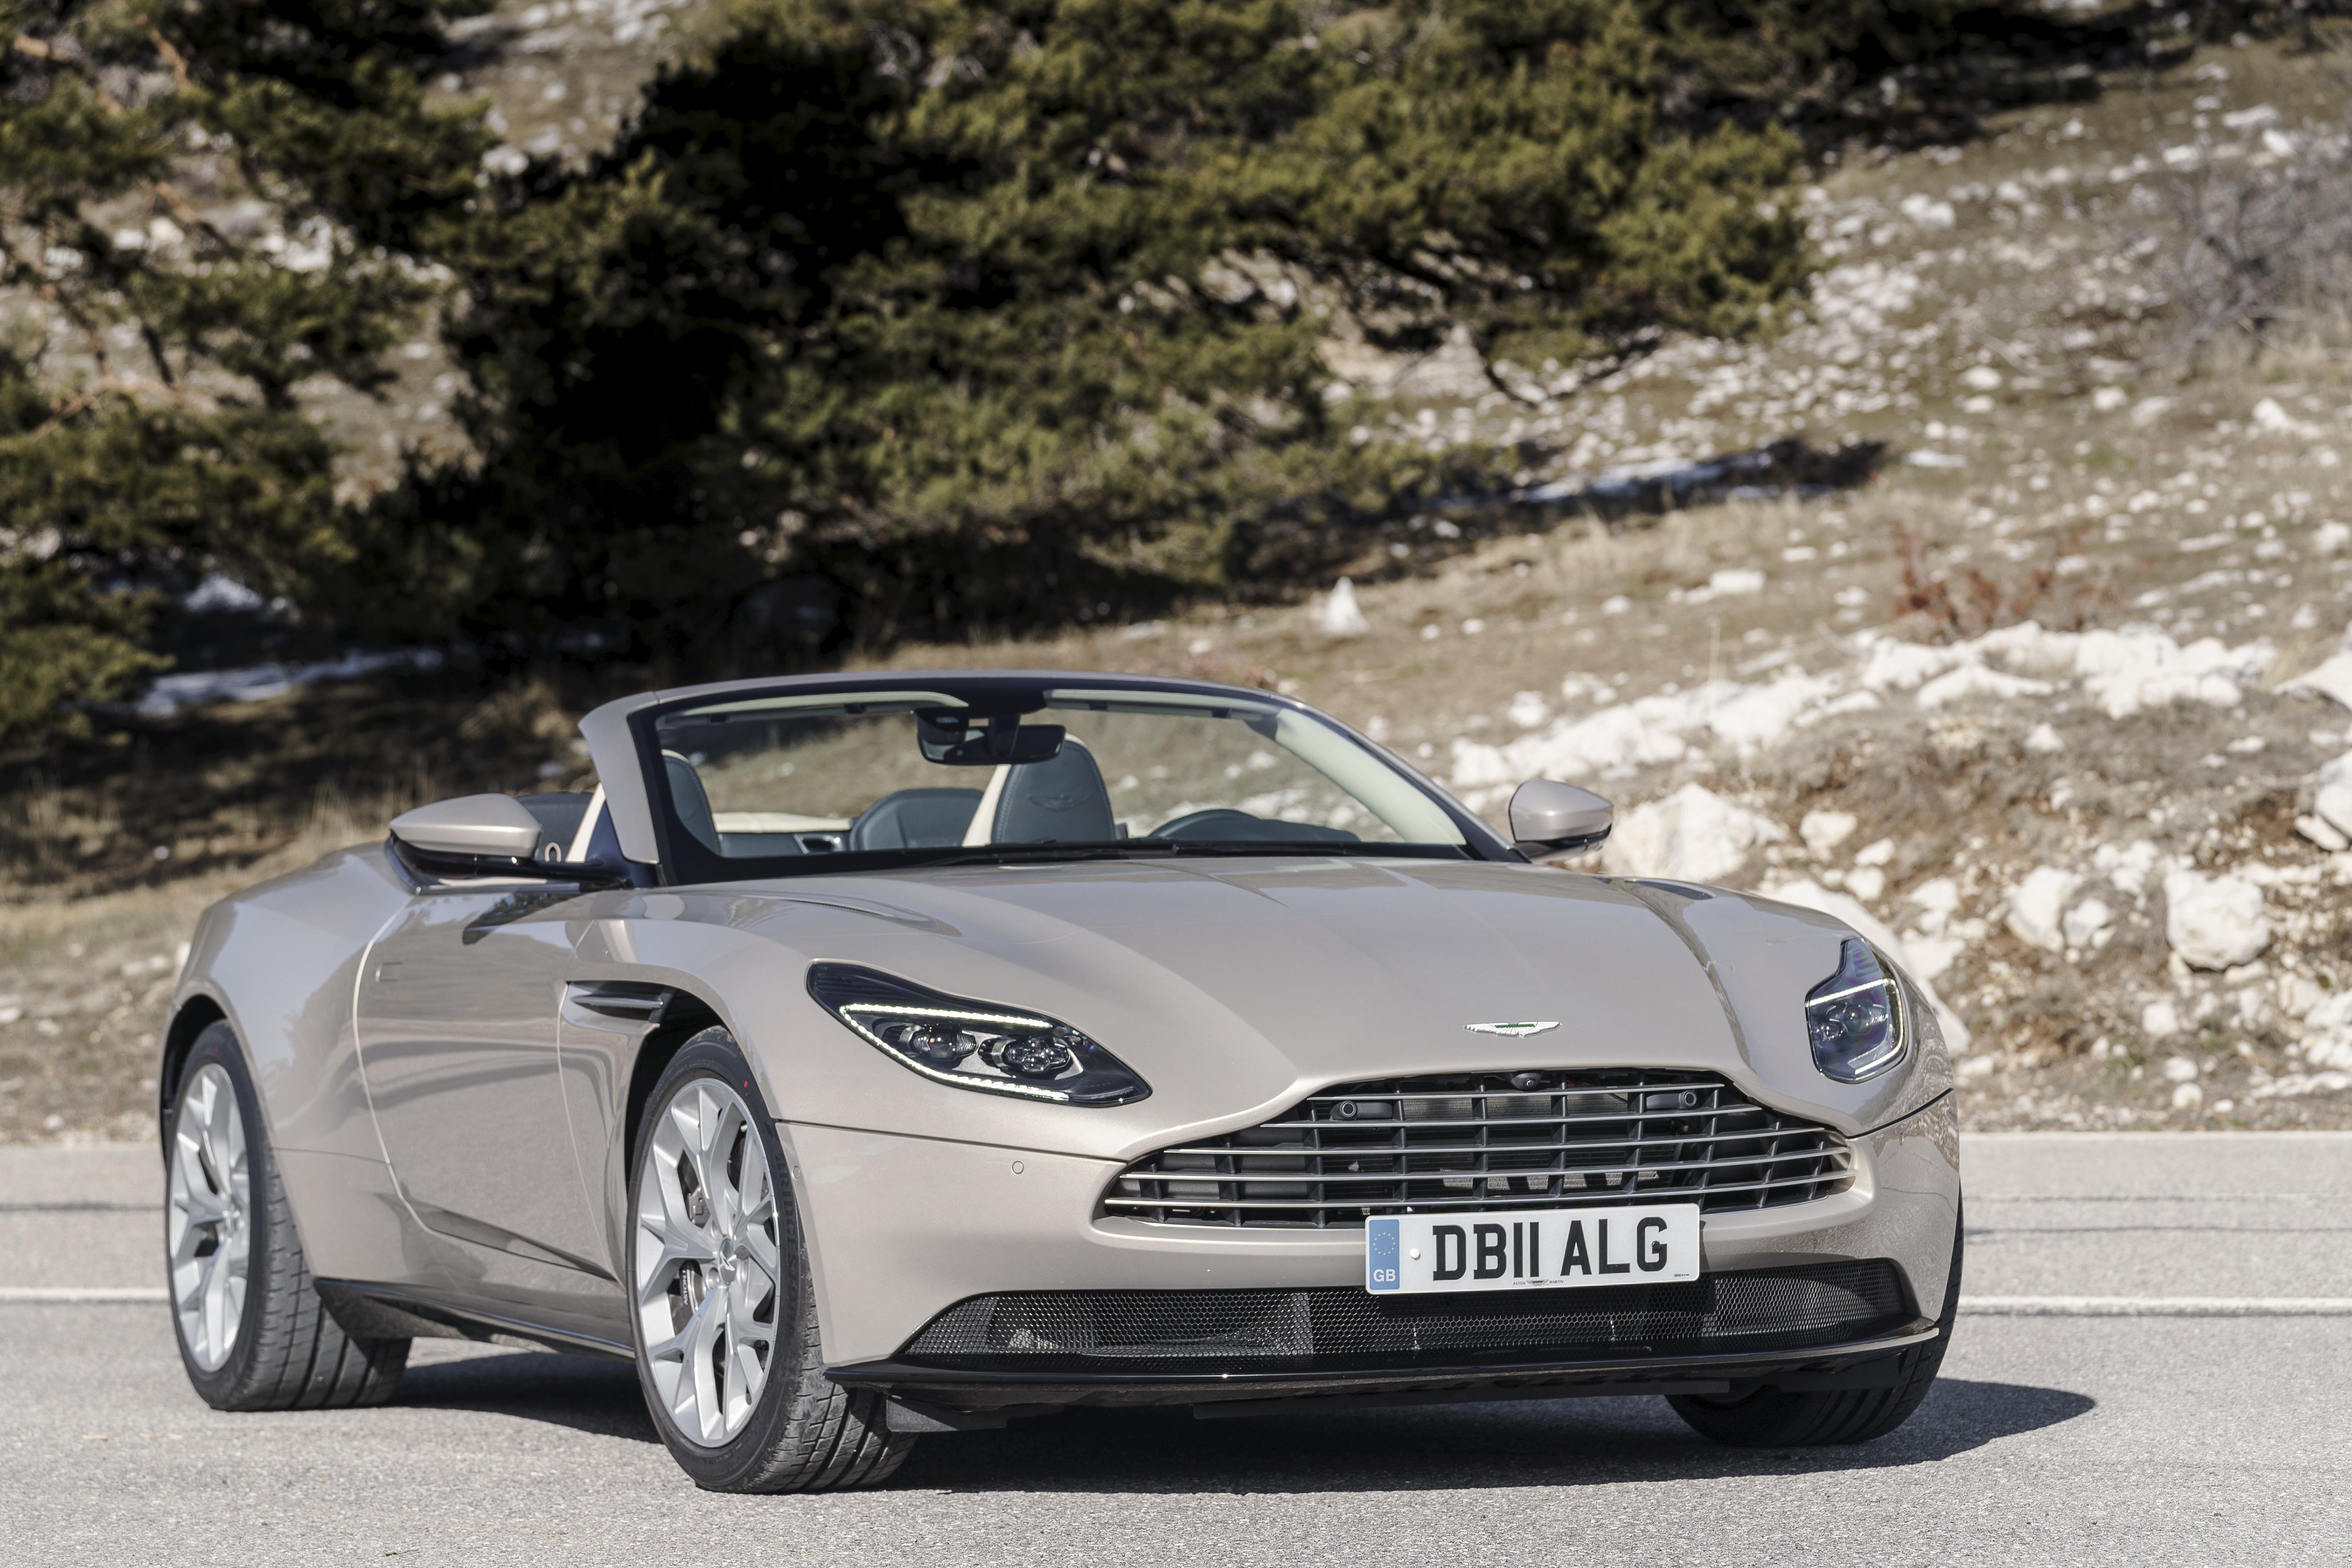 An Aston Martin DB11 Volante, a sleek high-performance convertible.